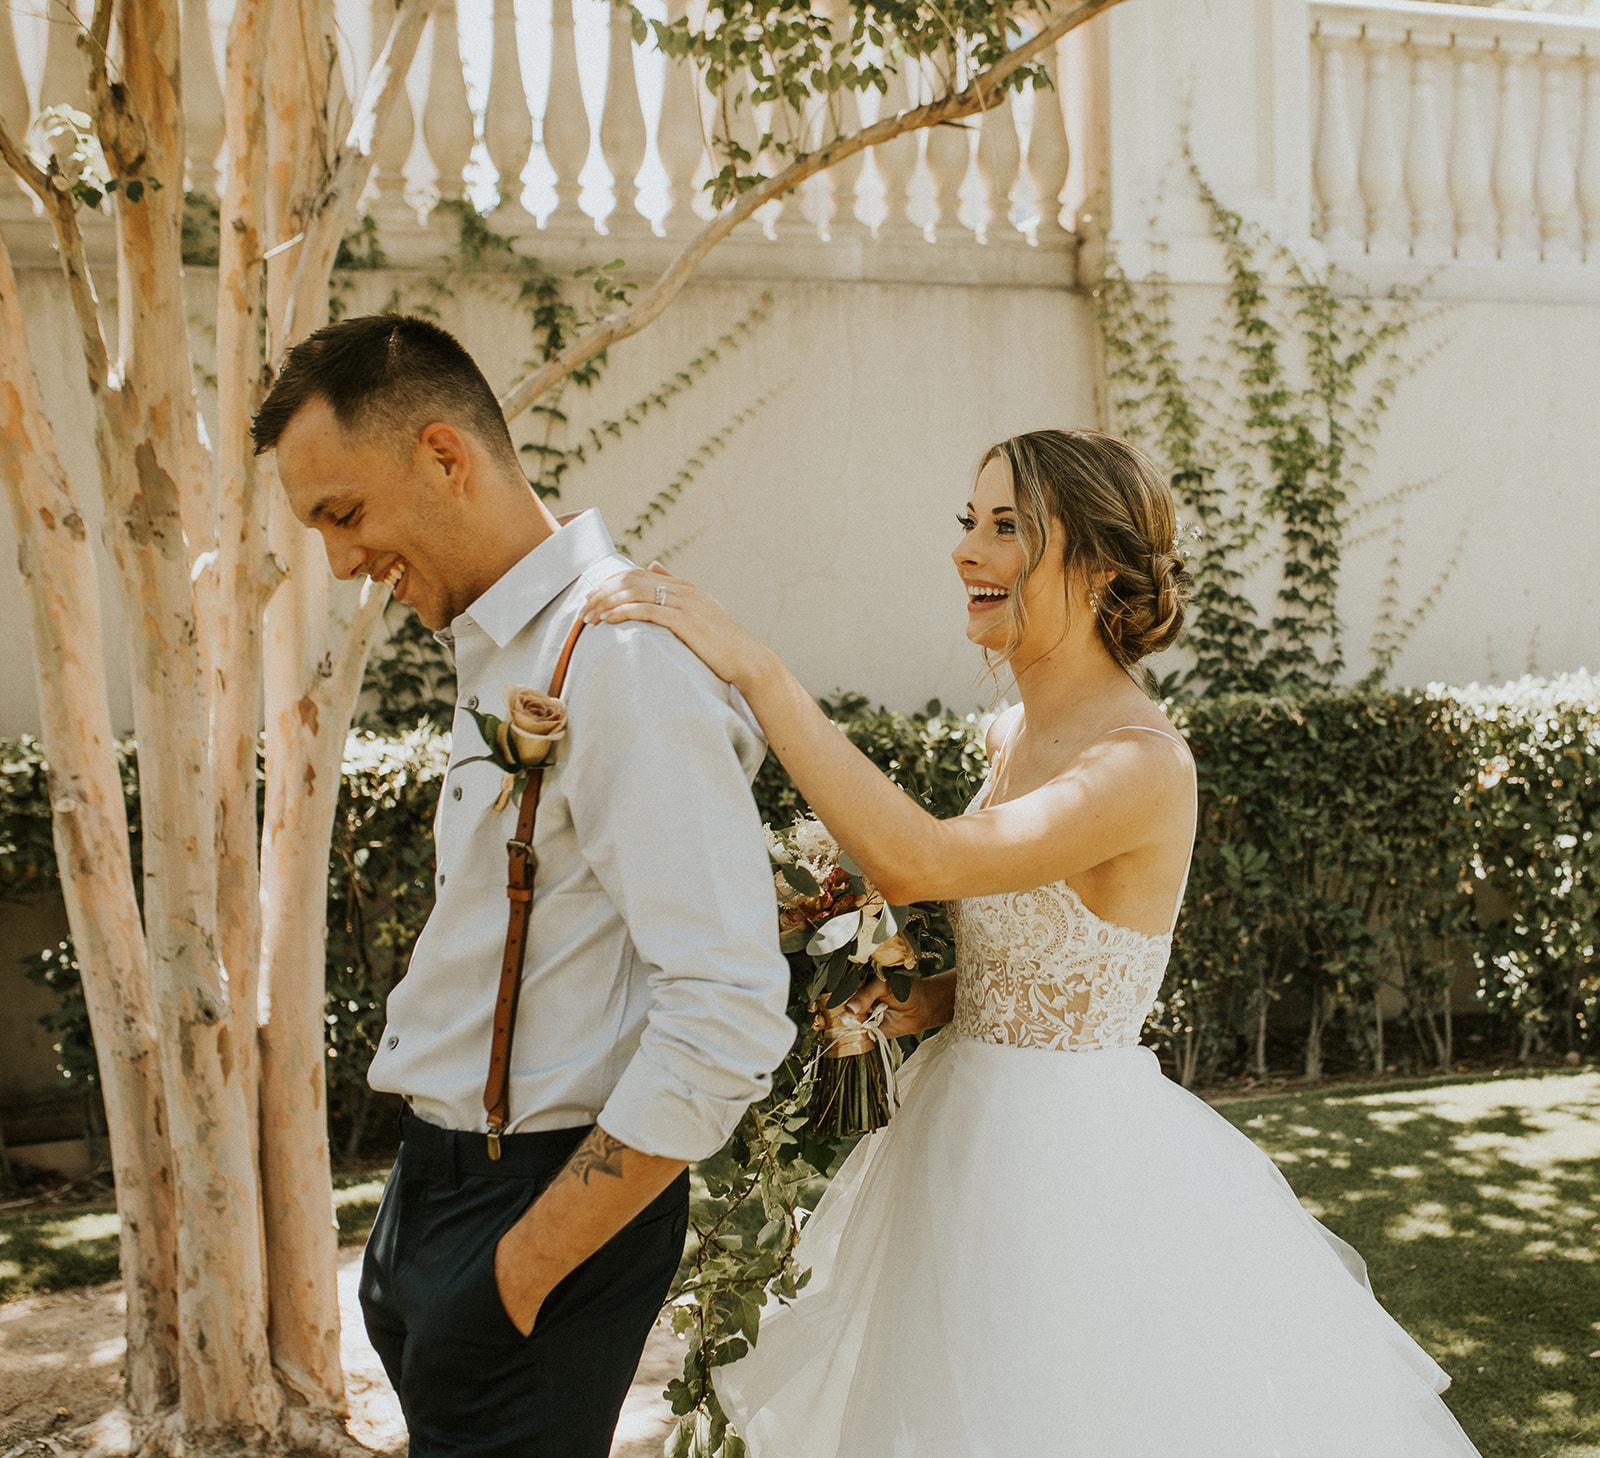 first look tap on shoulder spokane bride and groom